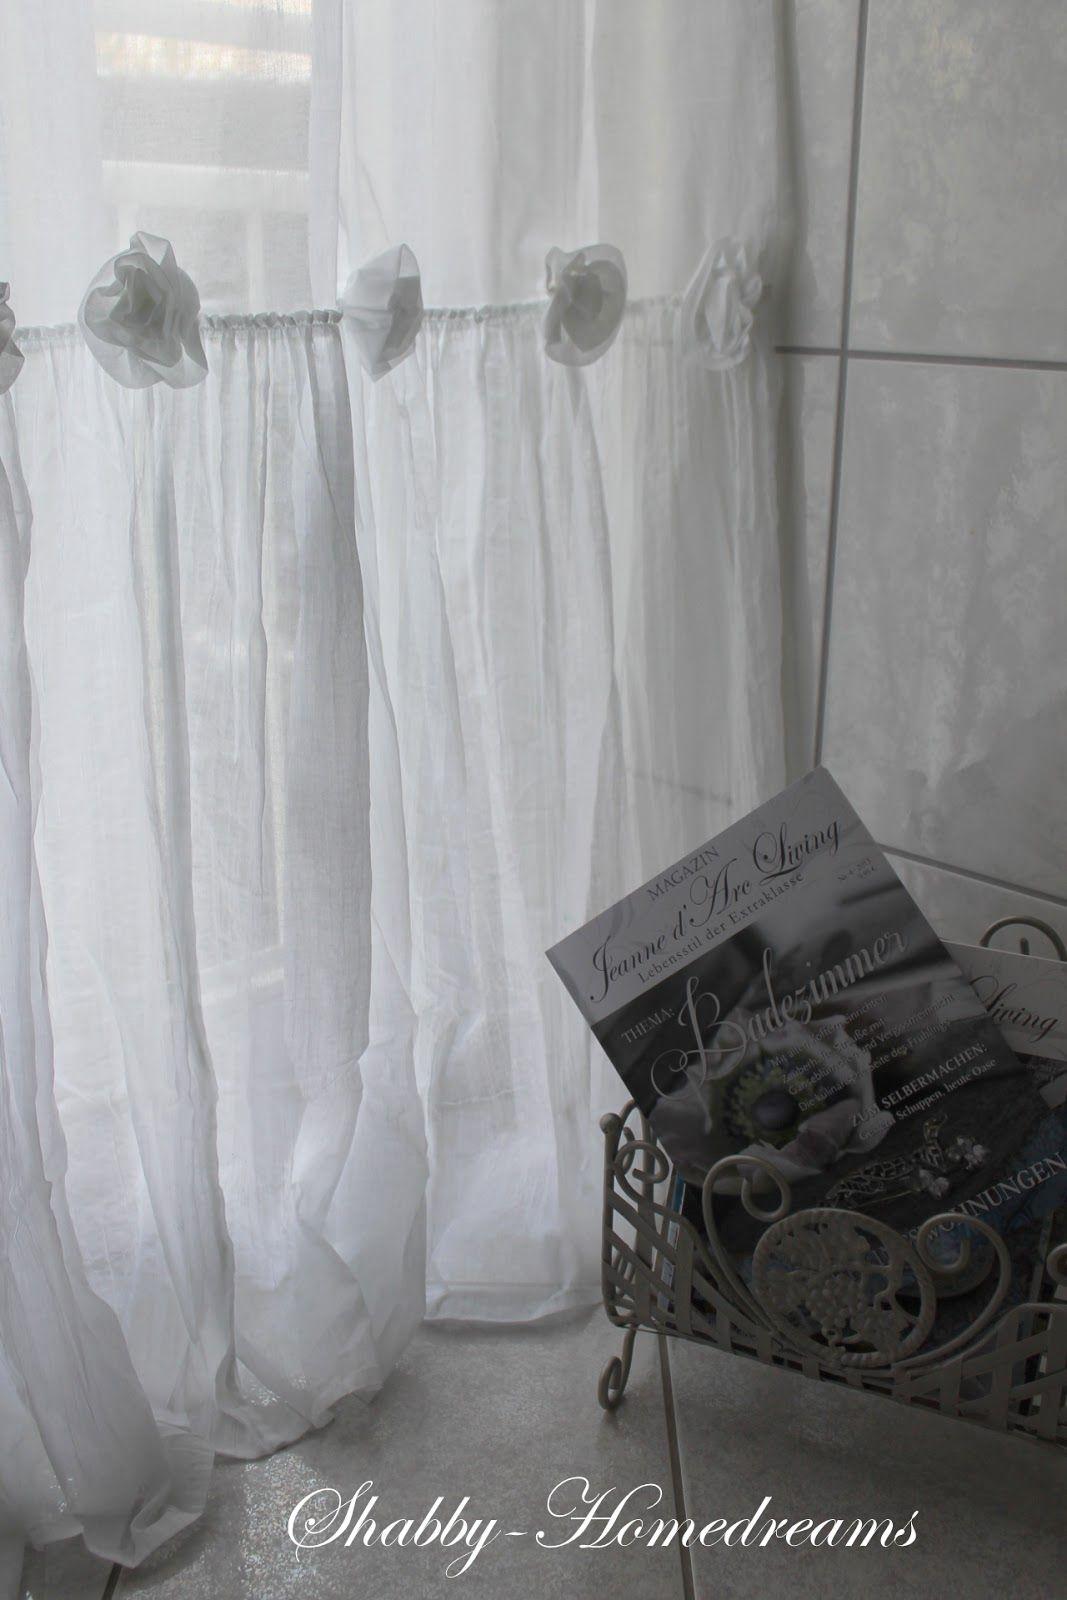 Bathroom Curtains White Chippy Shabby Chic Whitewashed Romantic Cottage French Country Rustic Swedish Decor Ide Gardinen Shabby Chic Badezimmer Shabby